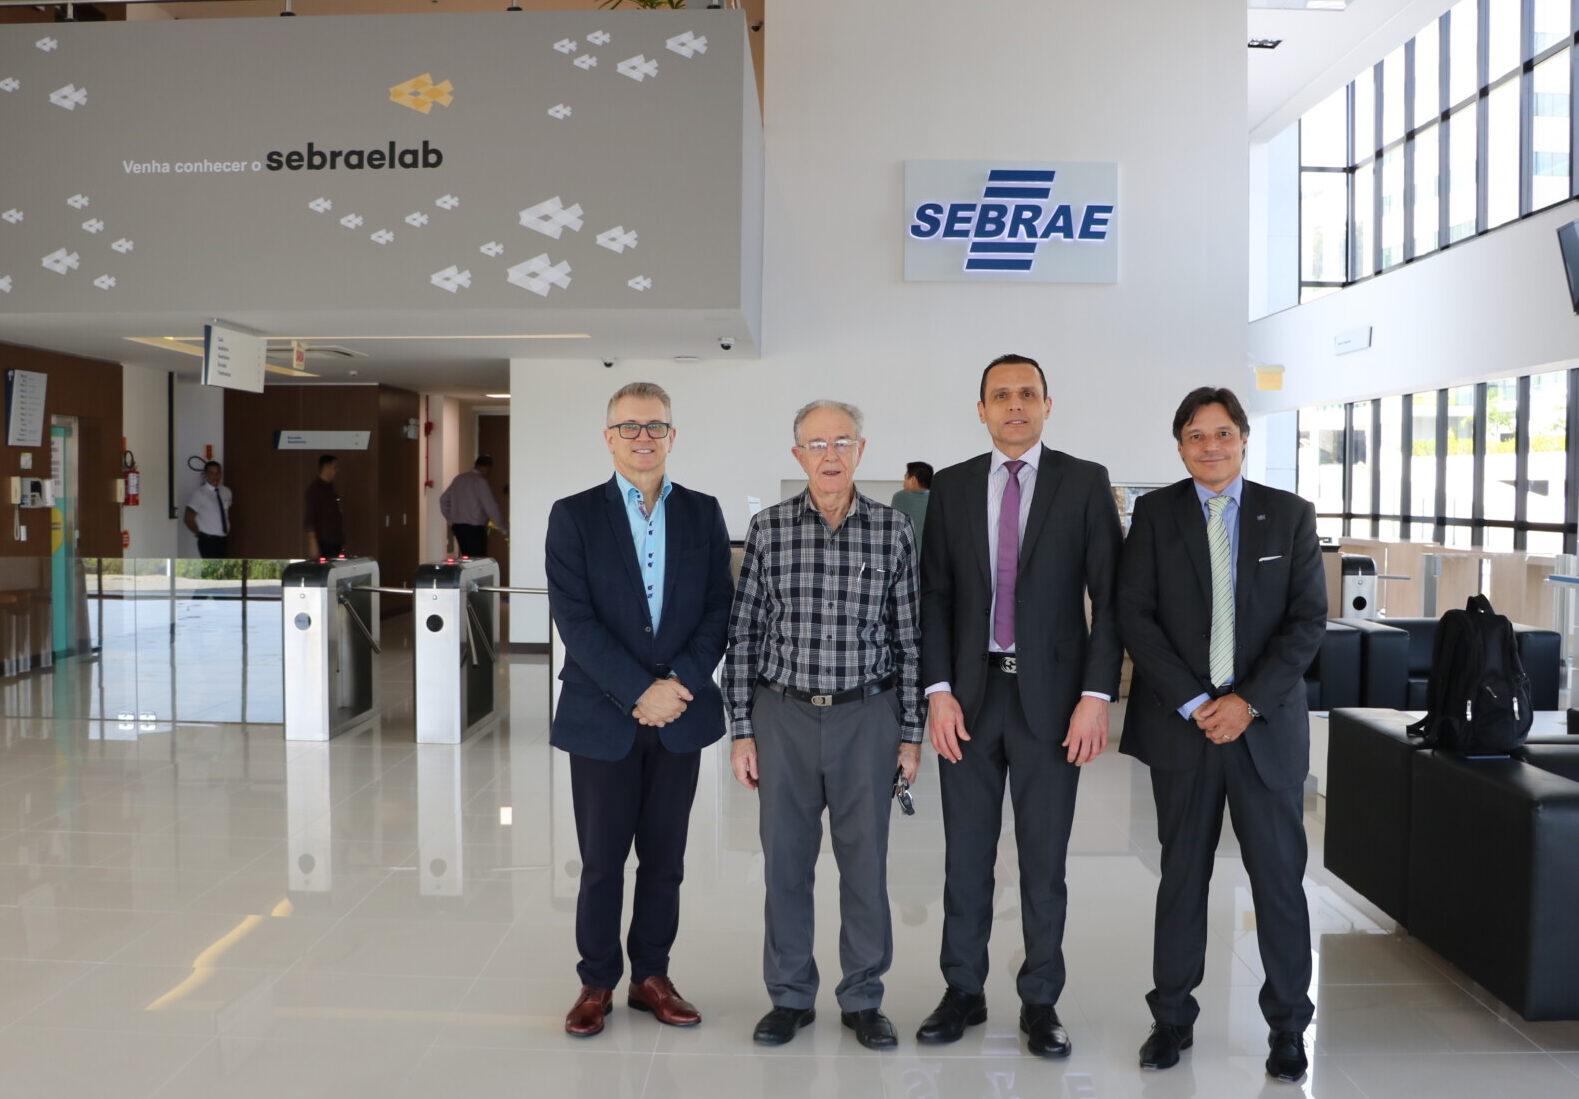 Visita ao Sebrae/SC